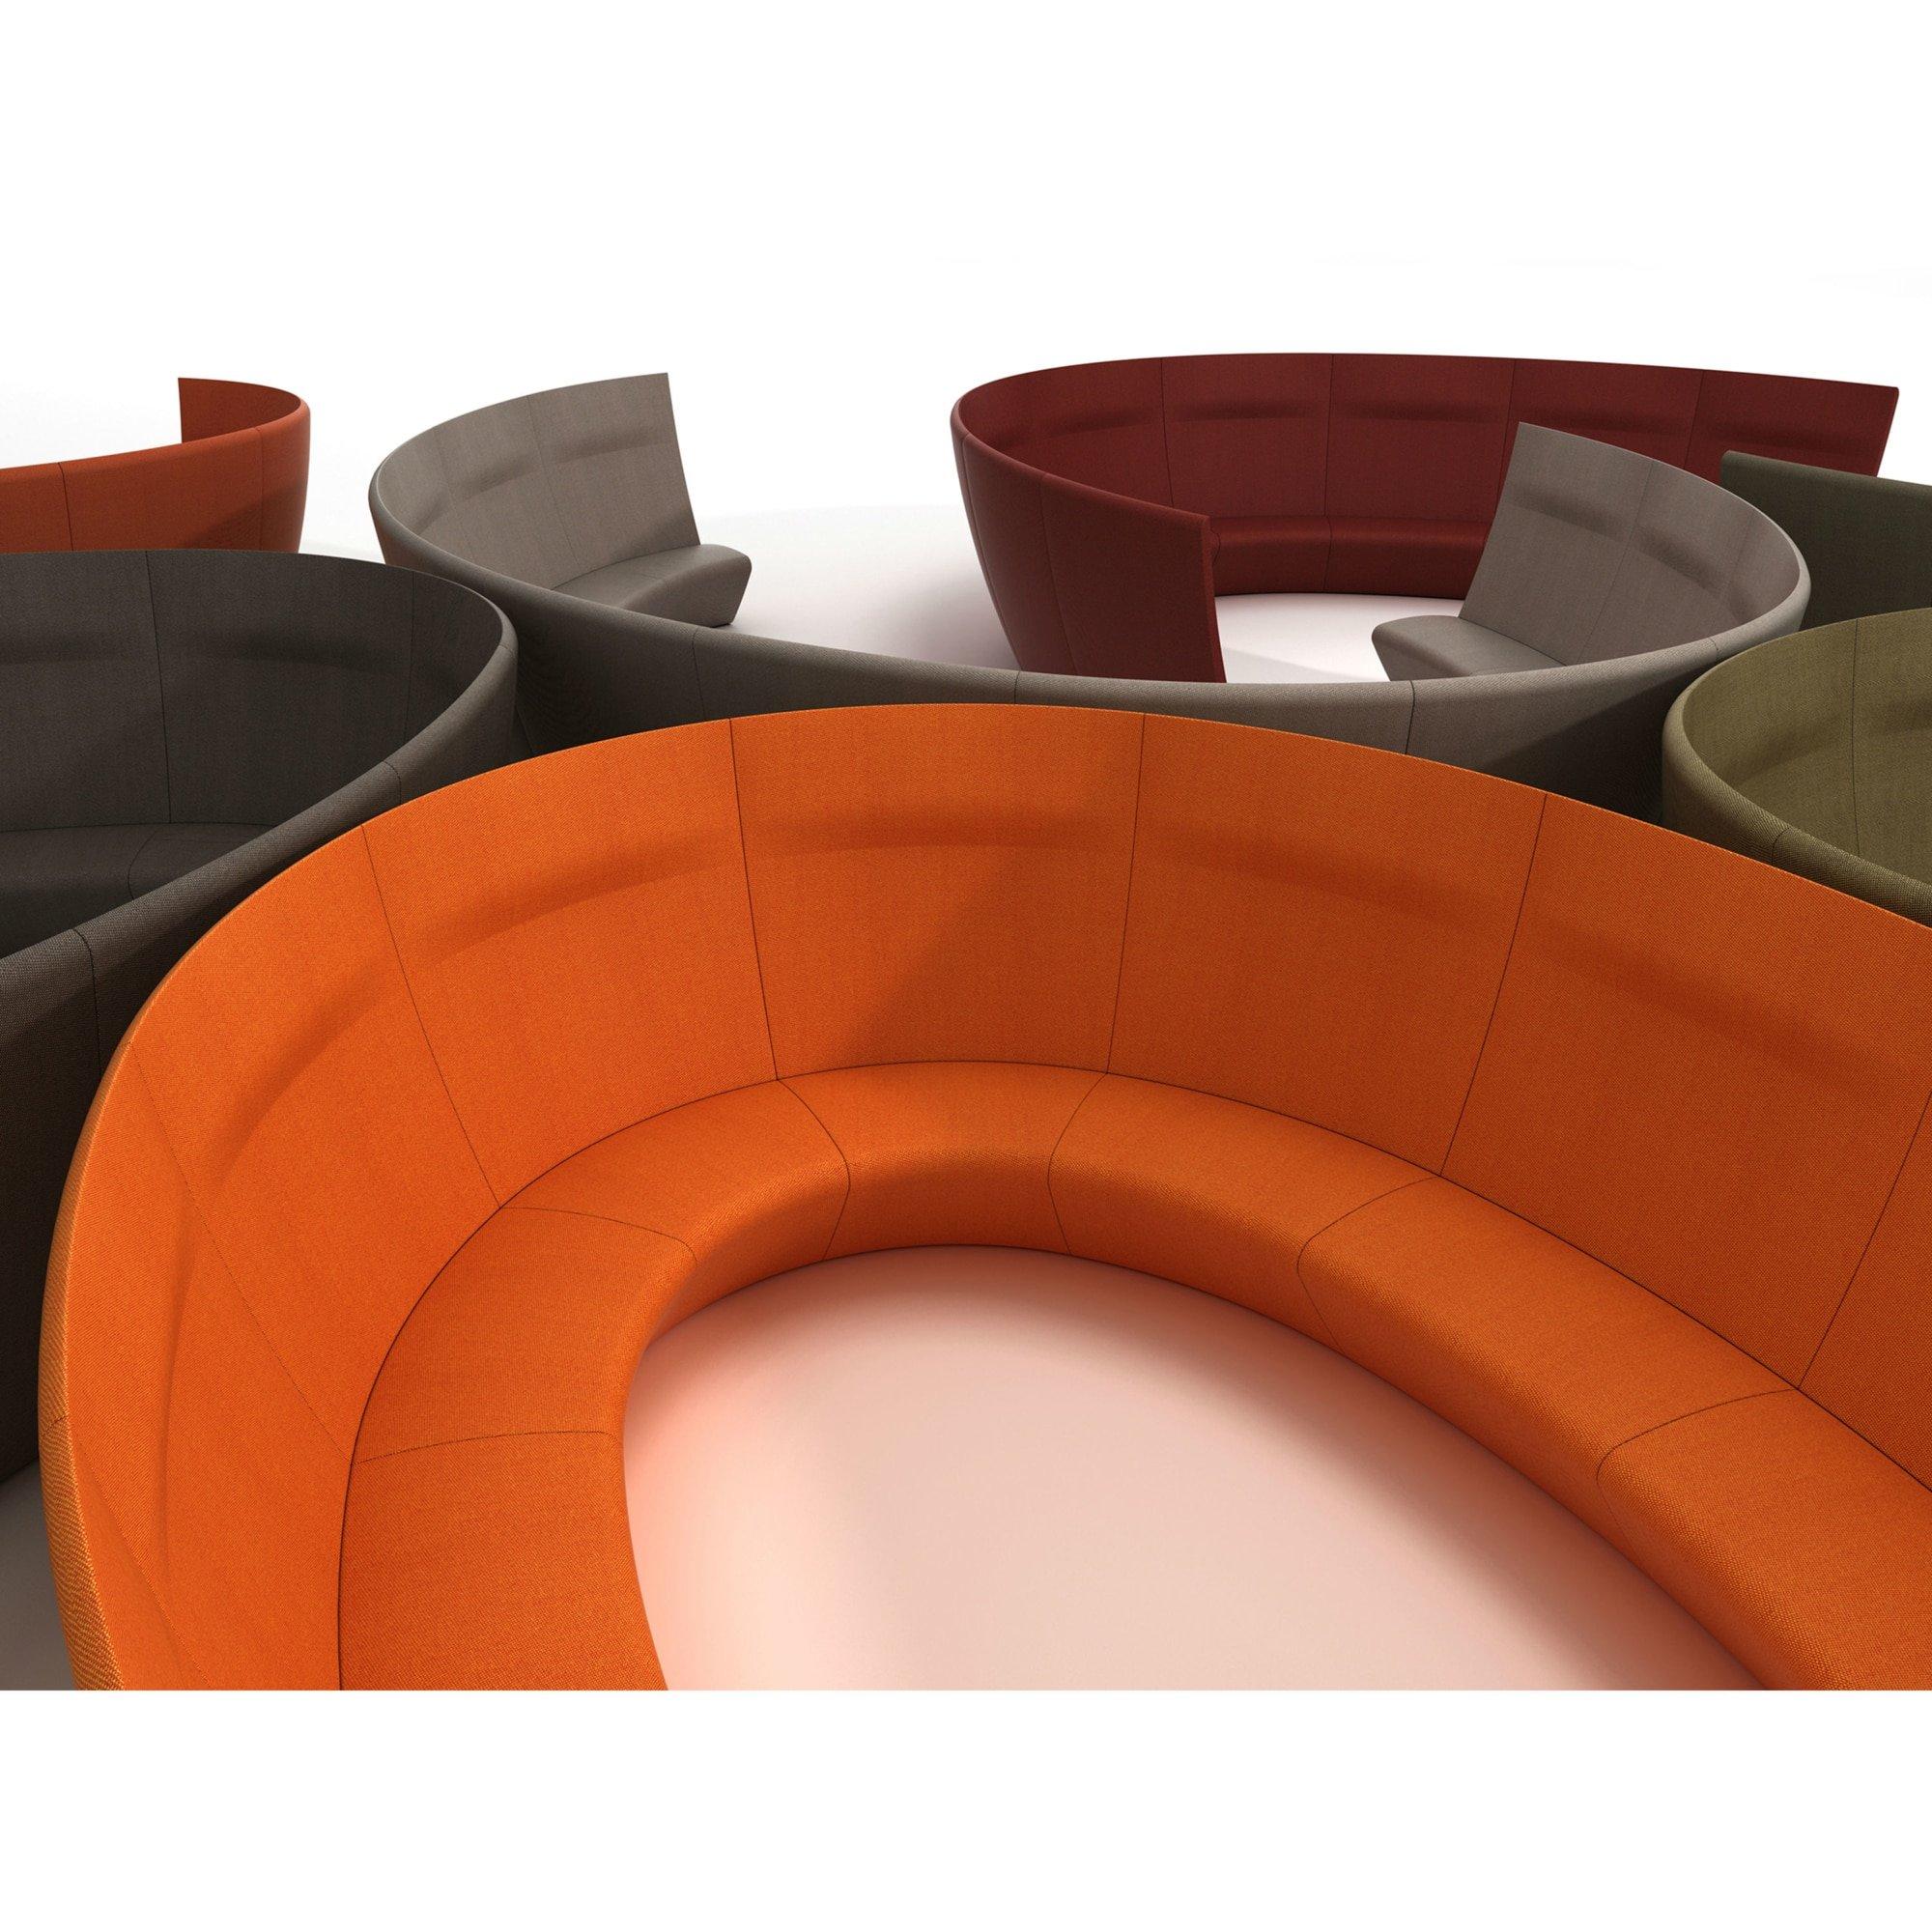 Collaborative contemporary seating